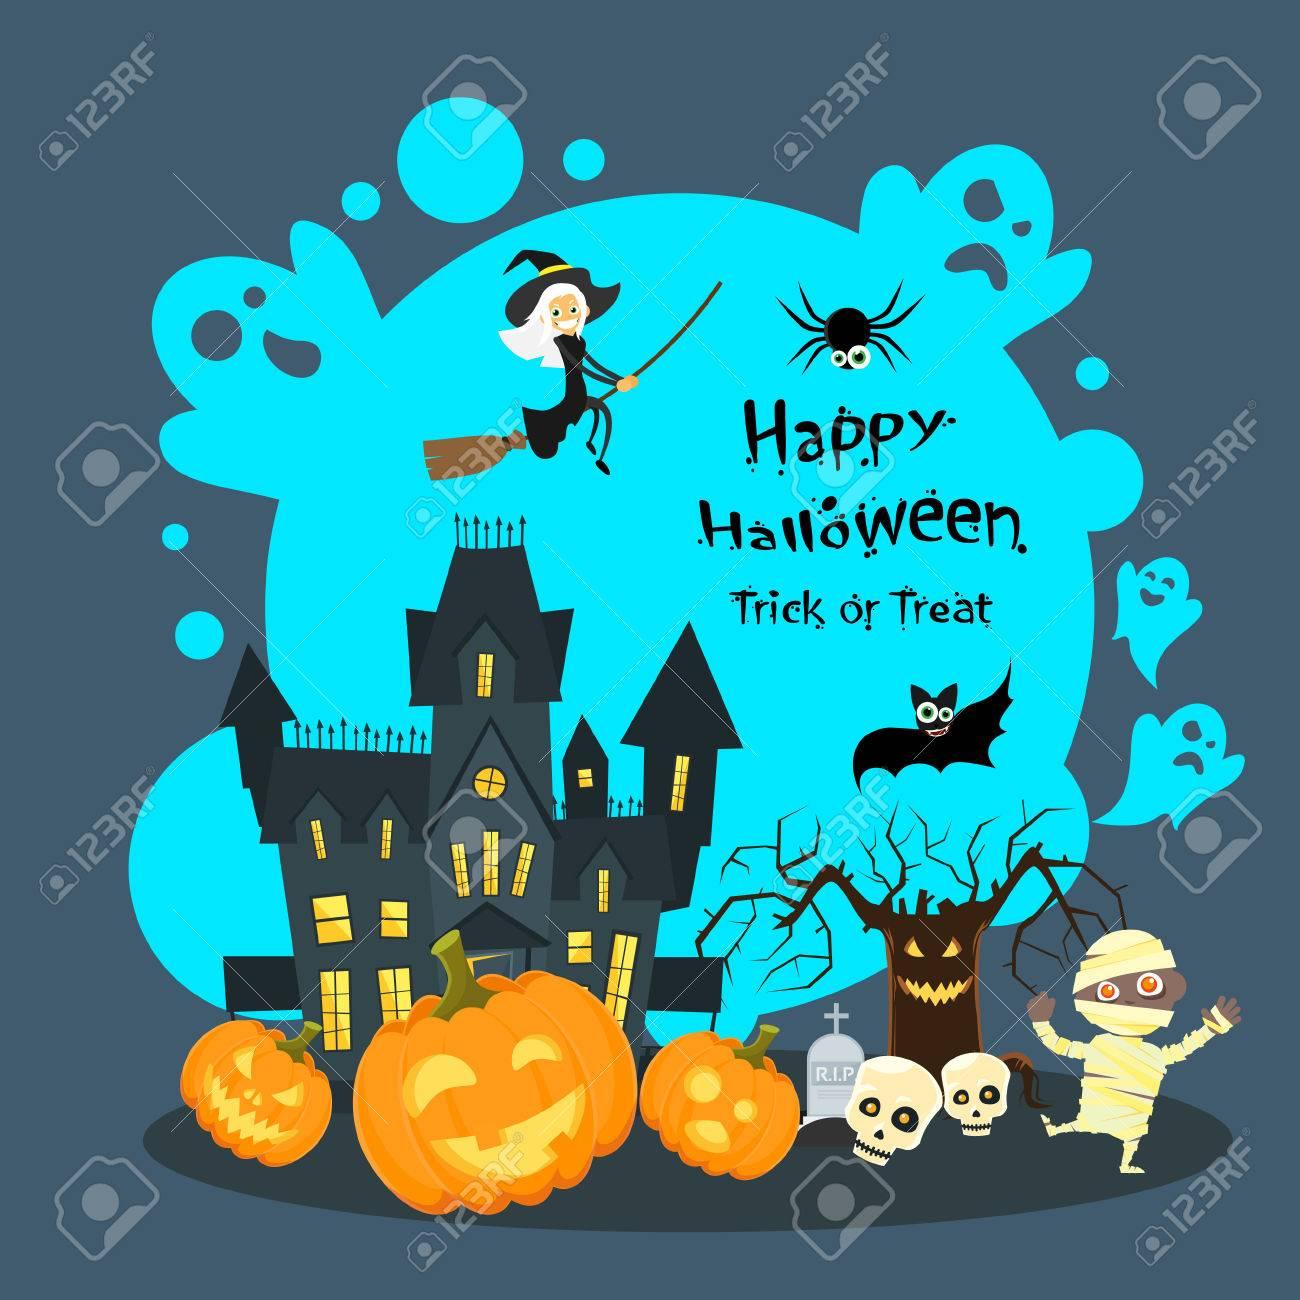 Halloween House Ghost Pumpkin Face Party Invitation Card Flat